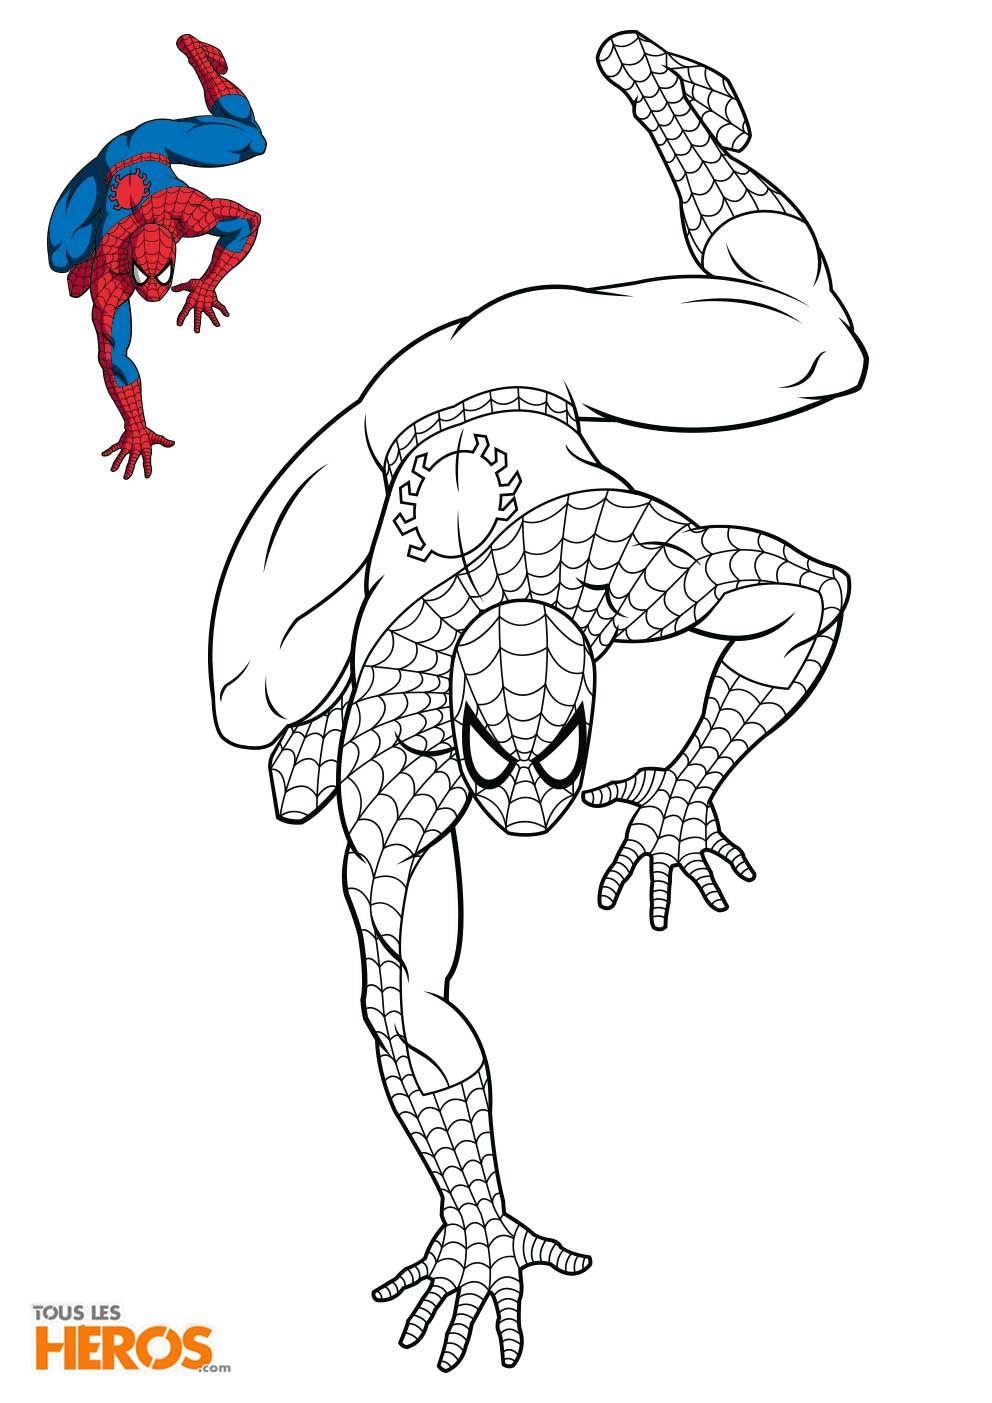 Coloriage spiderman, Coloriage batman, Coloriage